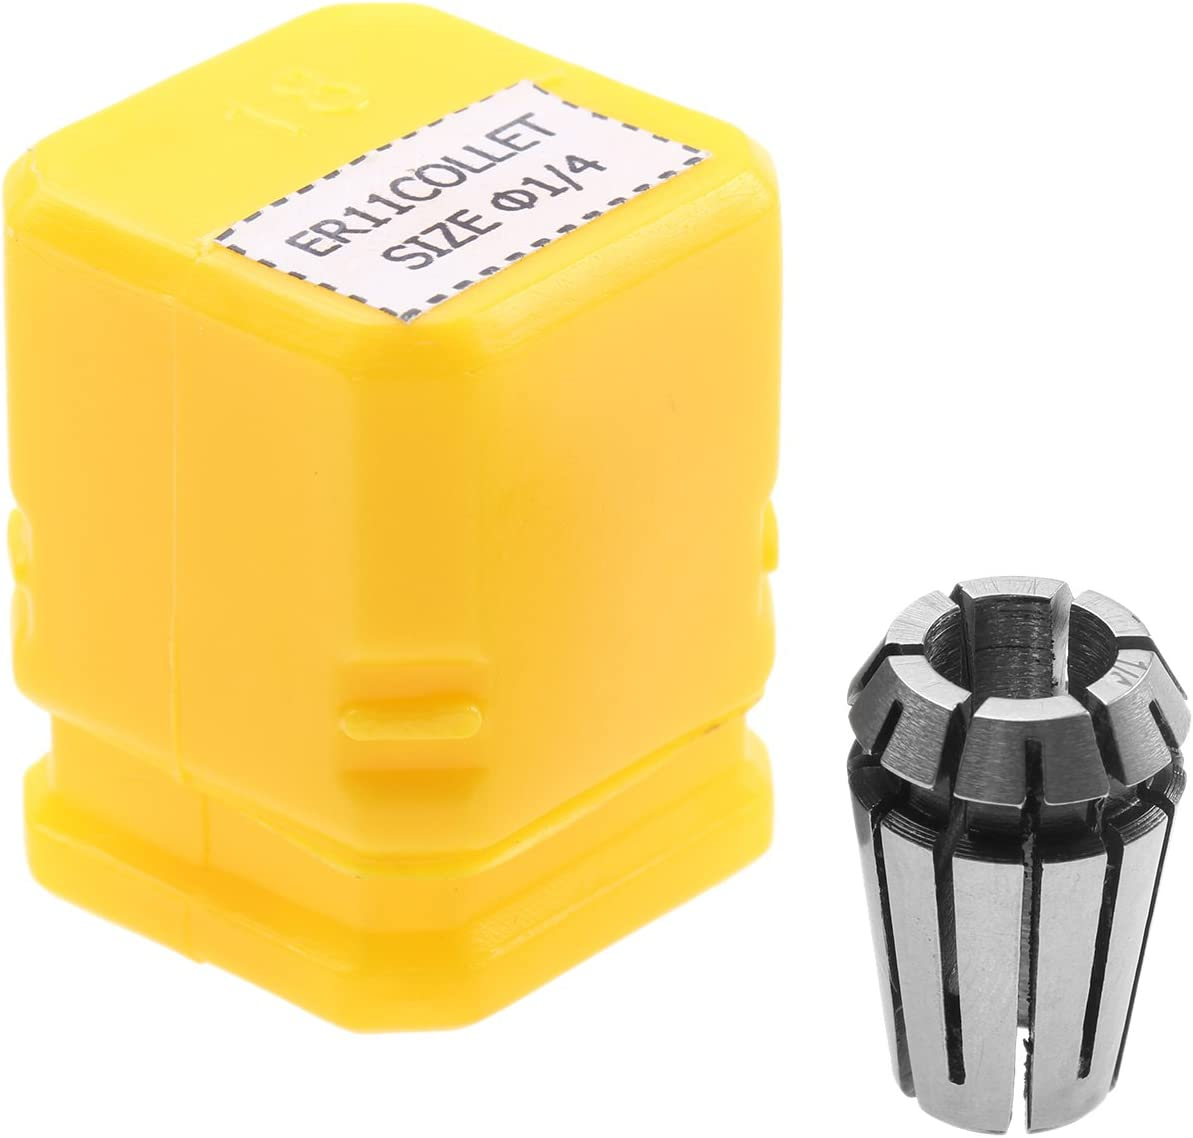 ER11 Collet Chuck 2mm for CNC Milling Chuck Lathe Tool Holder Engraving Machine Spindle Motor Spring Collet